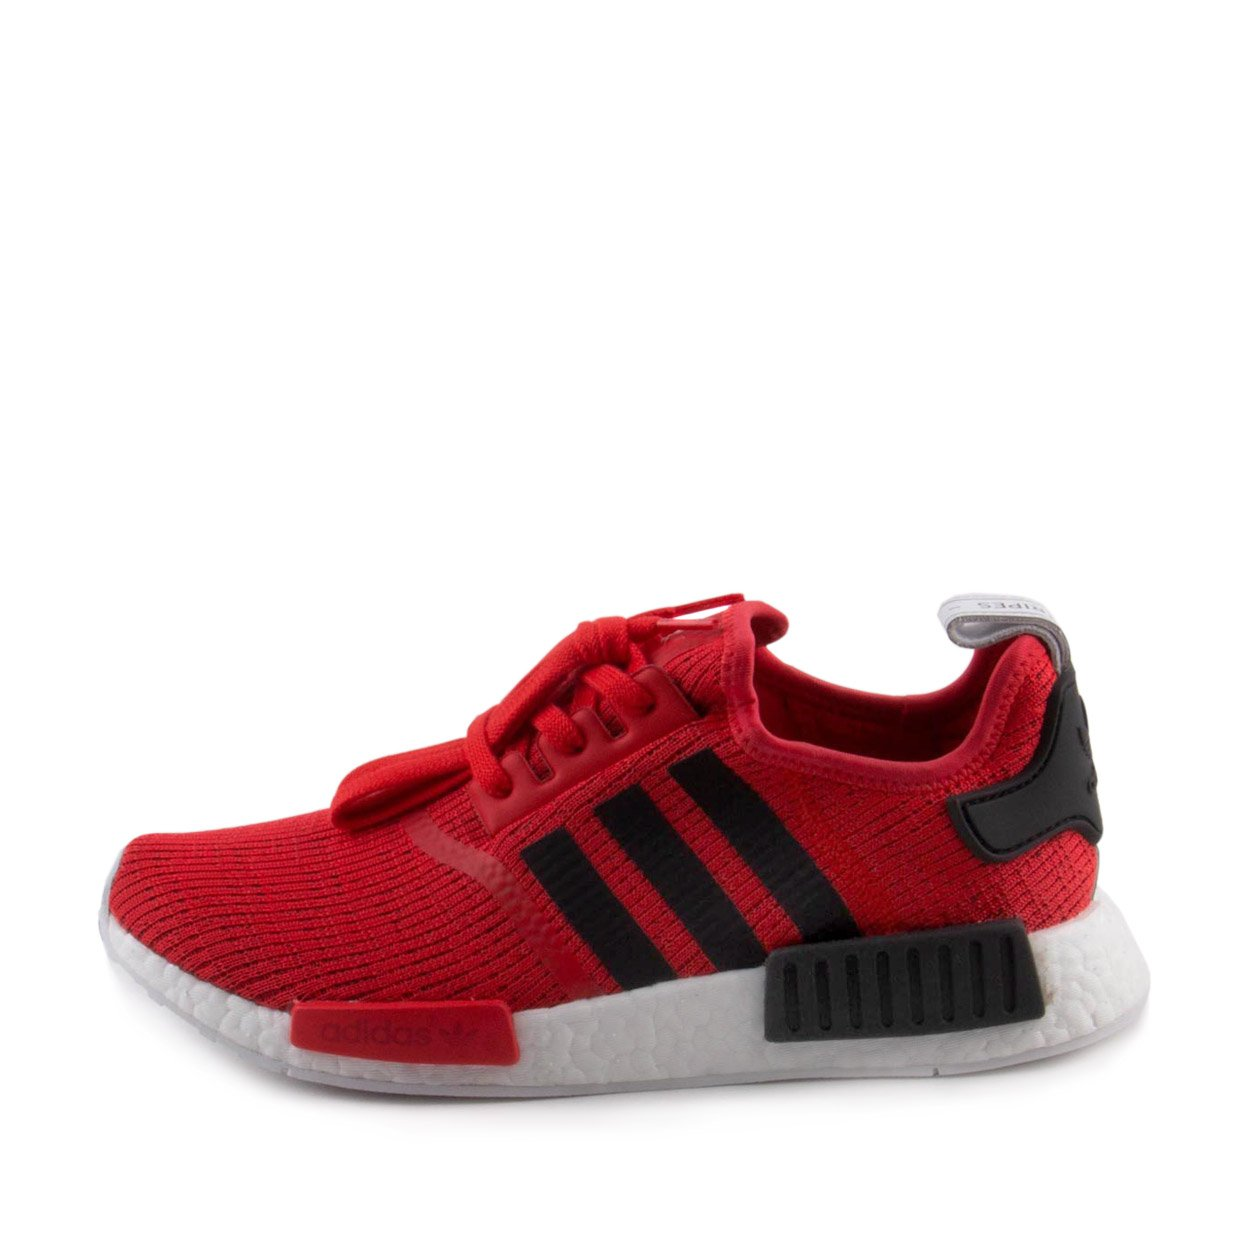 71c3d4d65fec3 Galleon - Adidas Mens NMD R1 Red Black Fabric Size 11.5